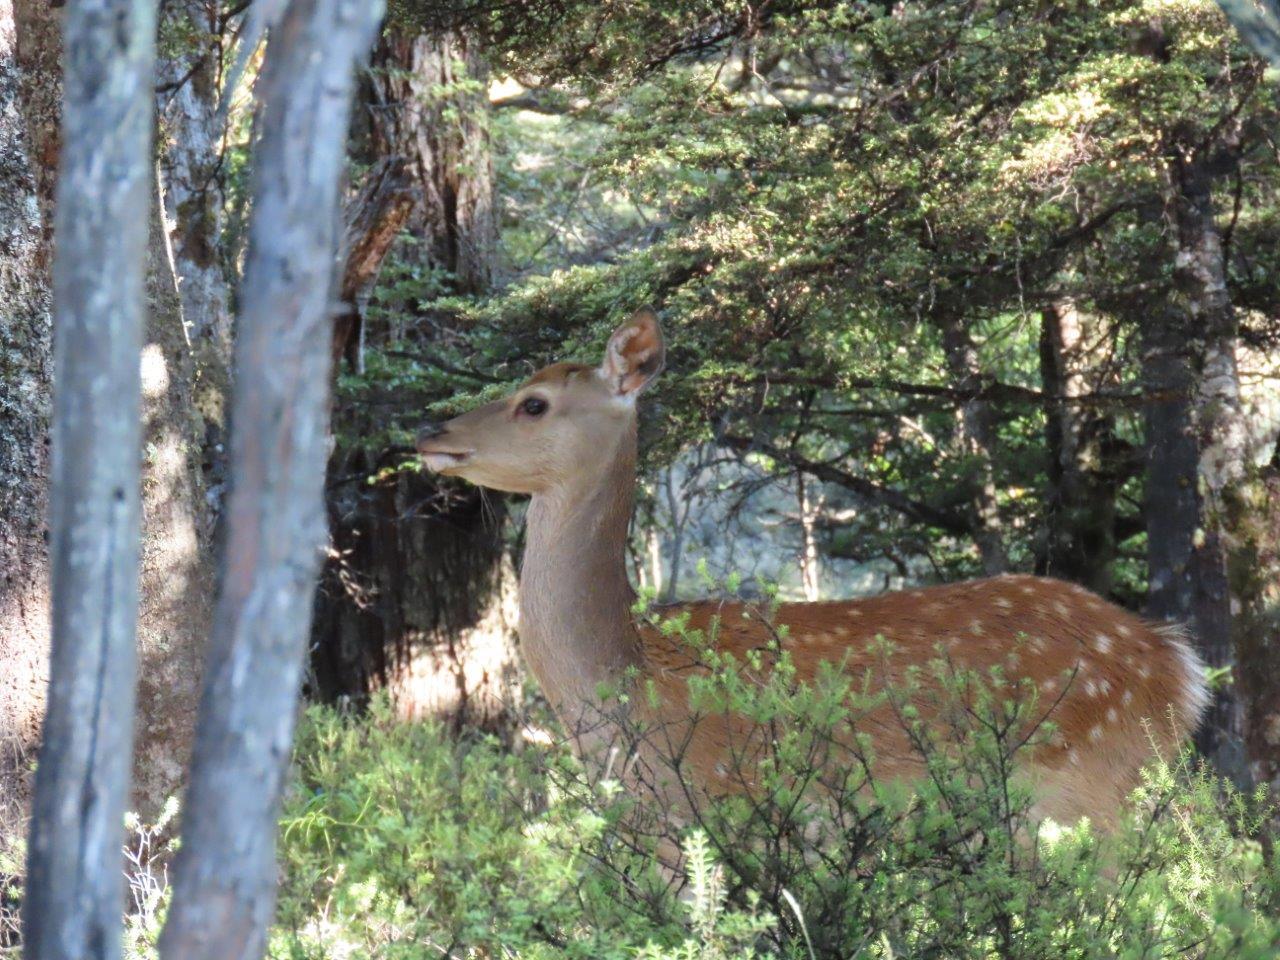 Sika in its natural habitat. Photo: Fiona Duley.